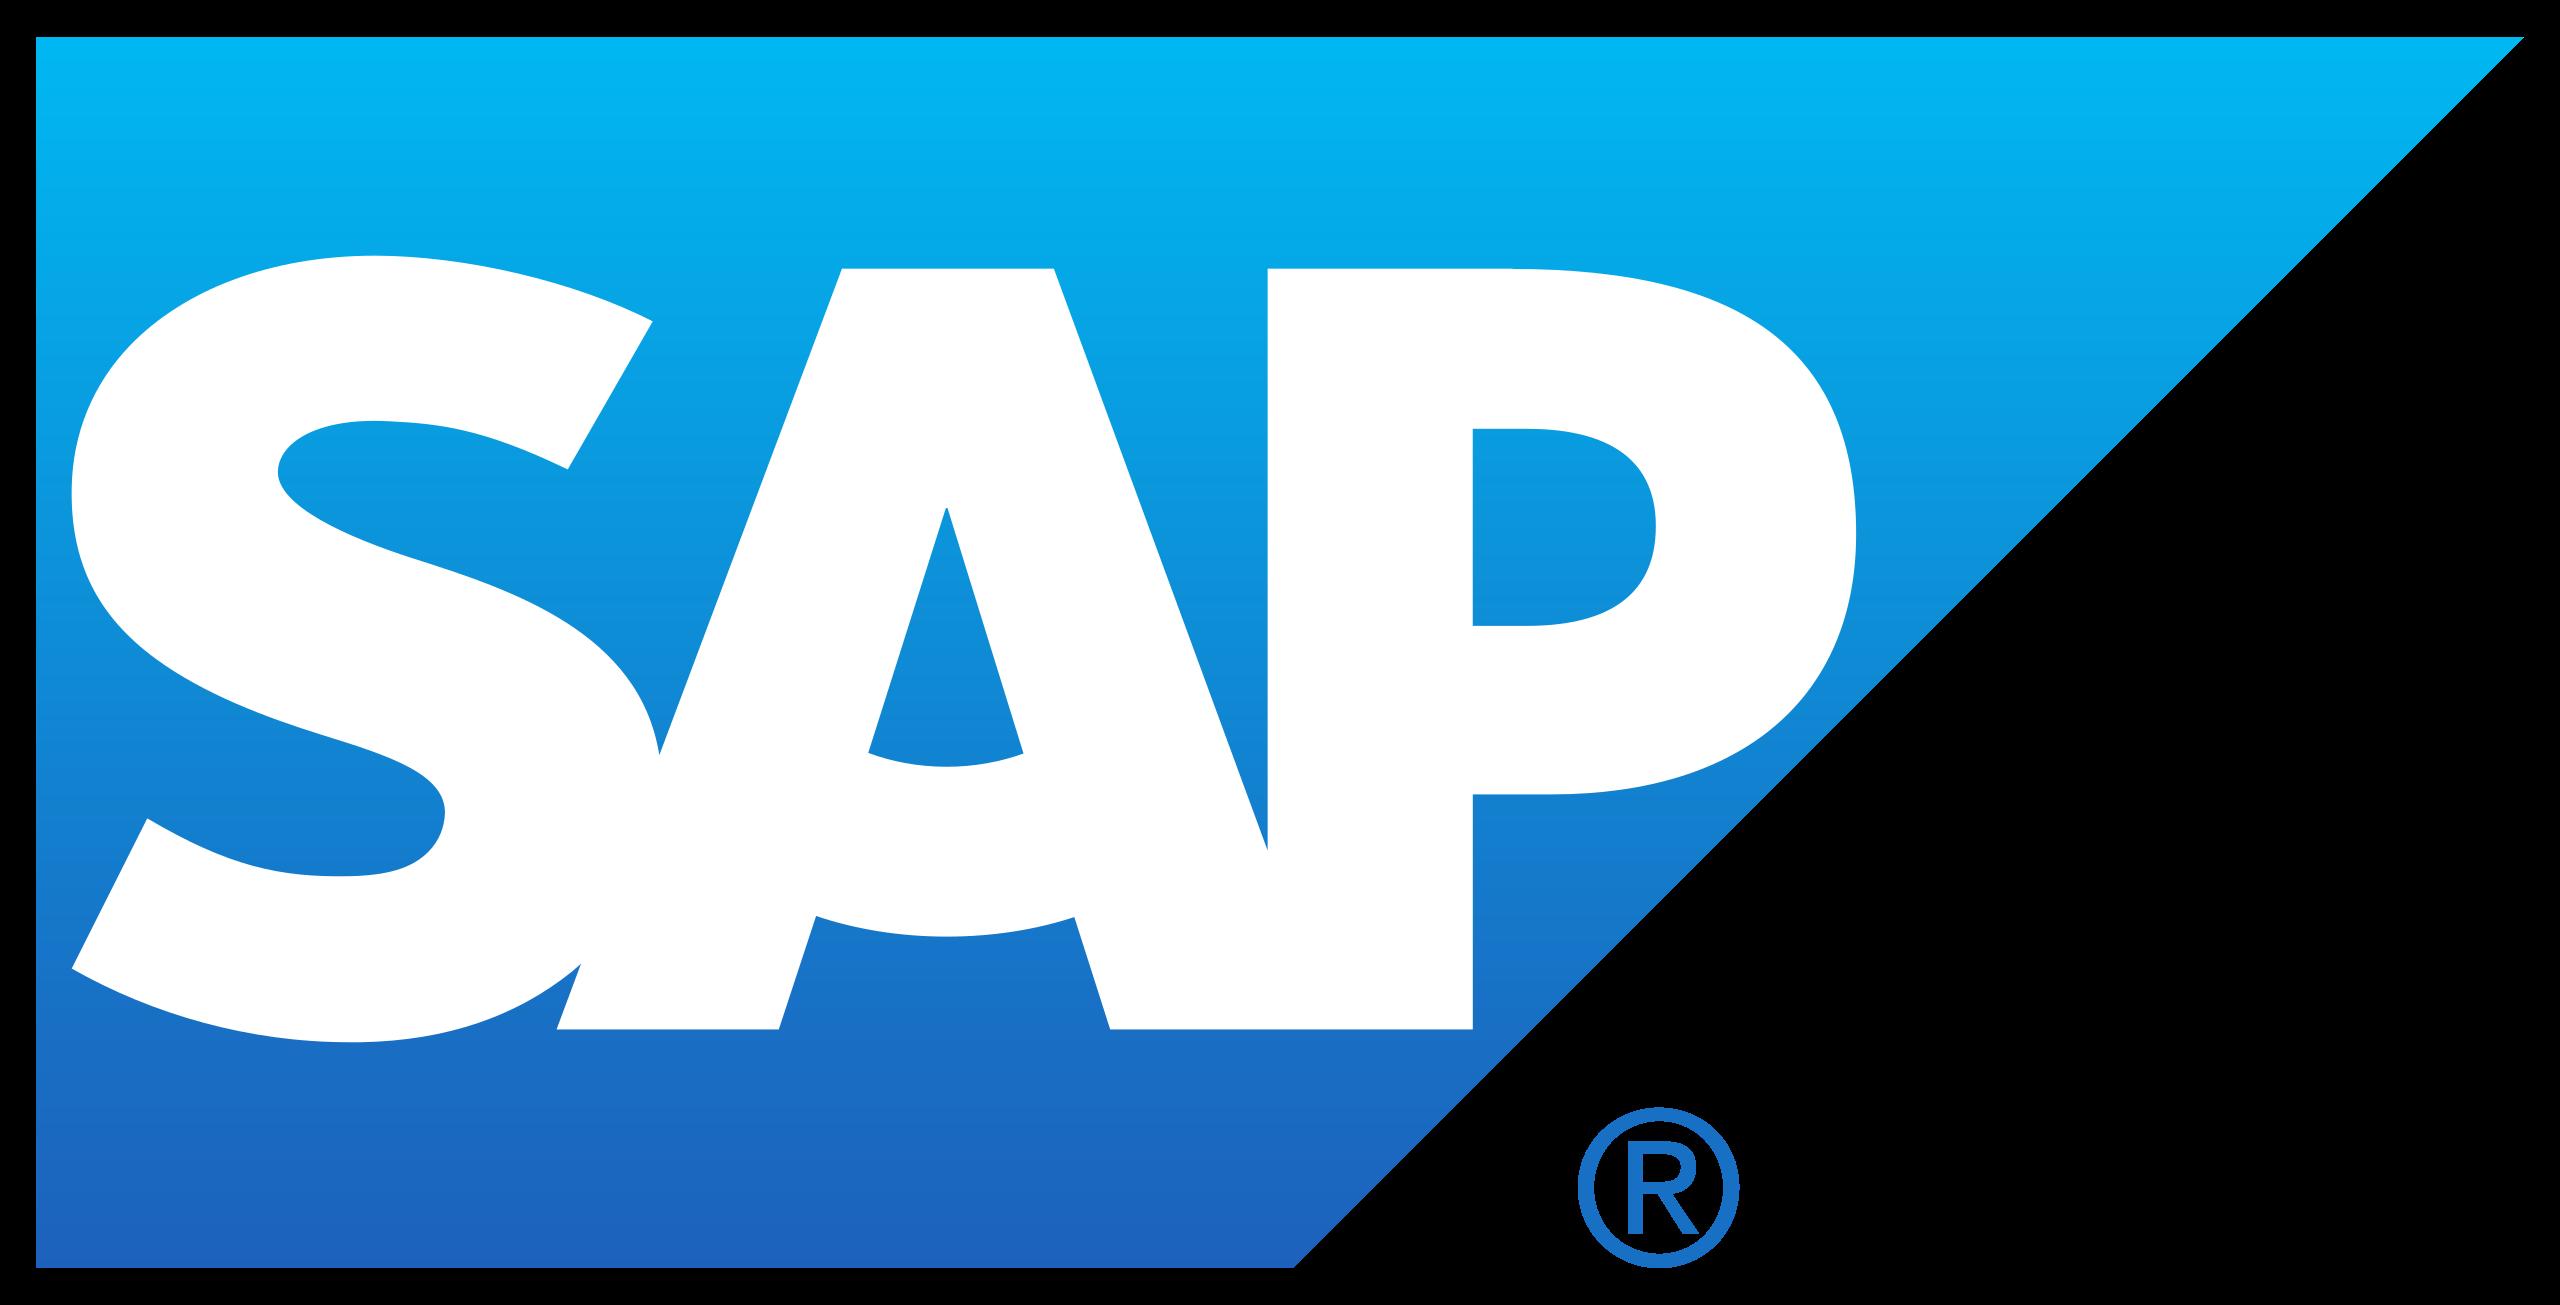 Depot November 2020: SAP Logo